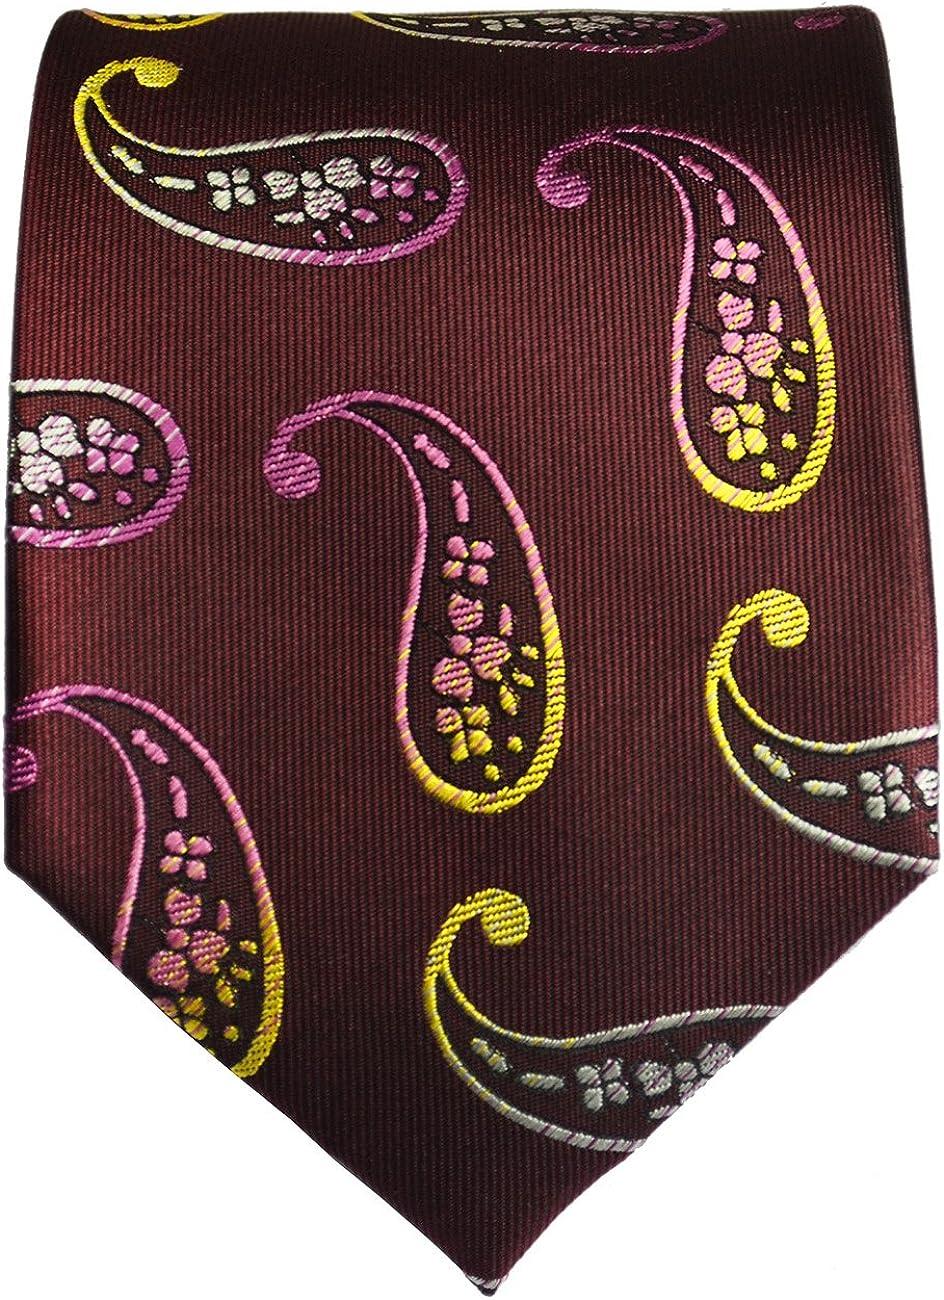 Burgundy Paisley Paul Malone Silk Tie and Pocket Square